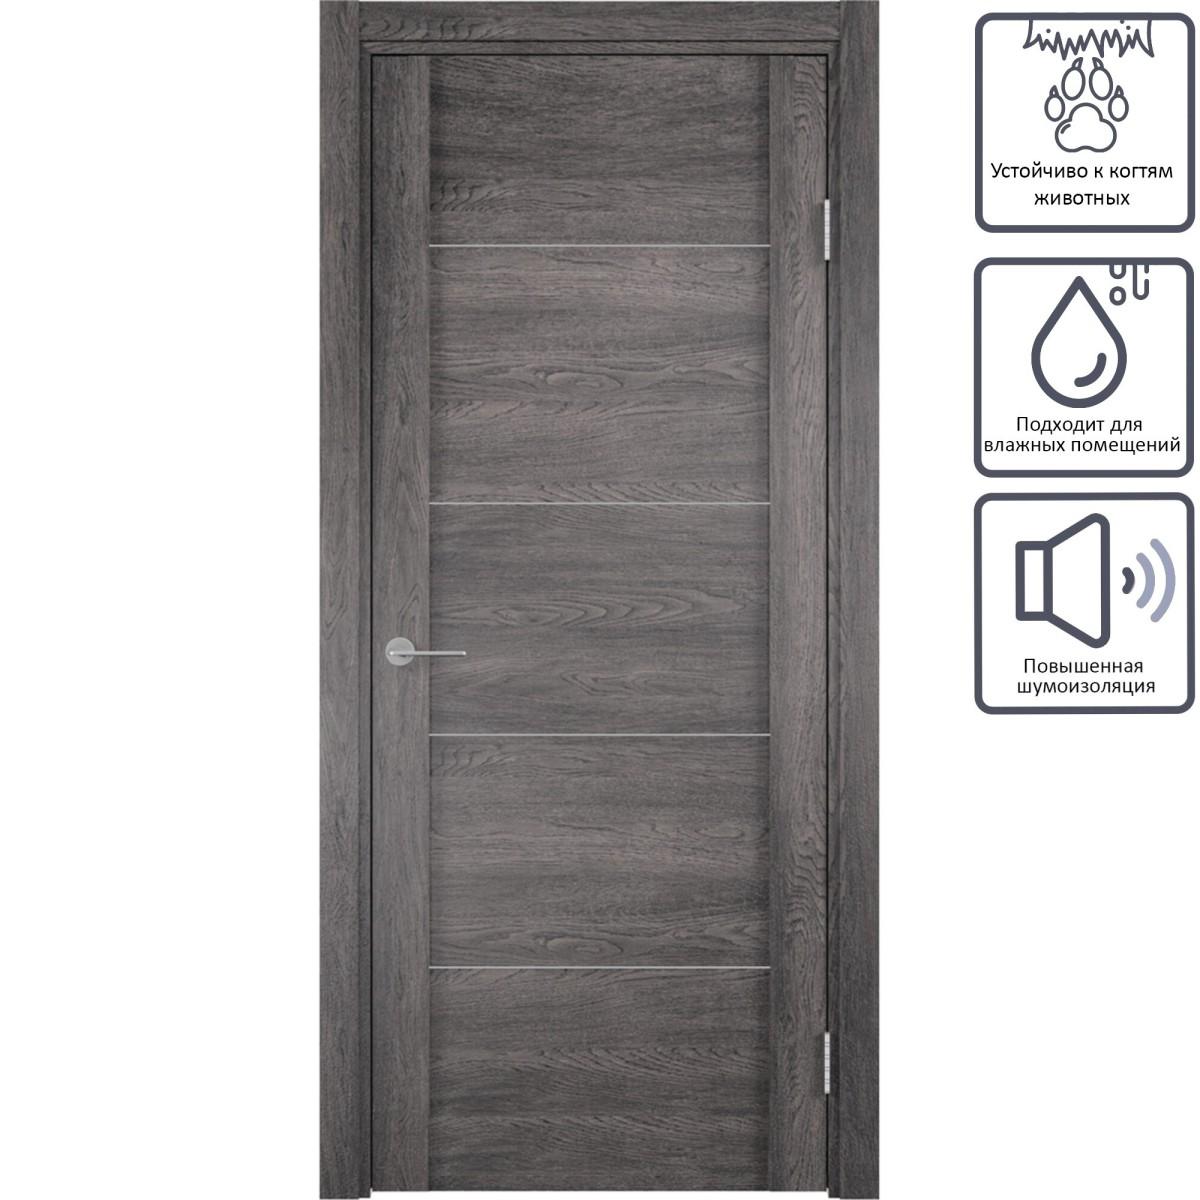 Дверь Межкомнатная Глухая С Замком В Комплекте Квадро 200x60 Пвх Цвет Шале Серый